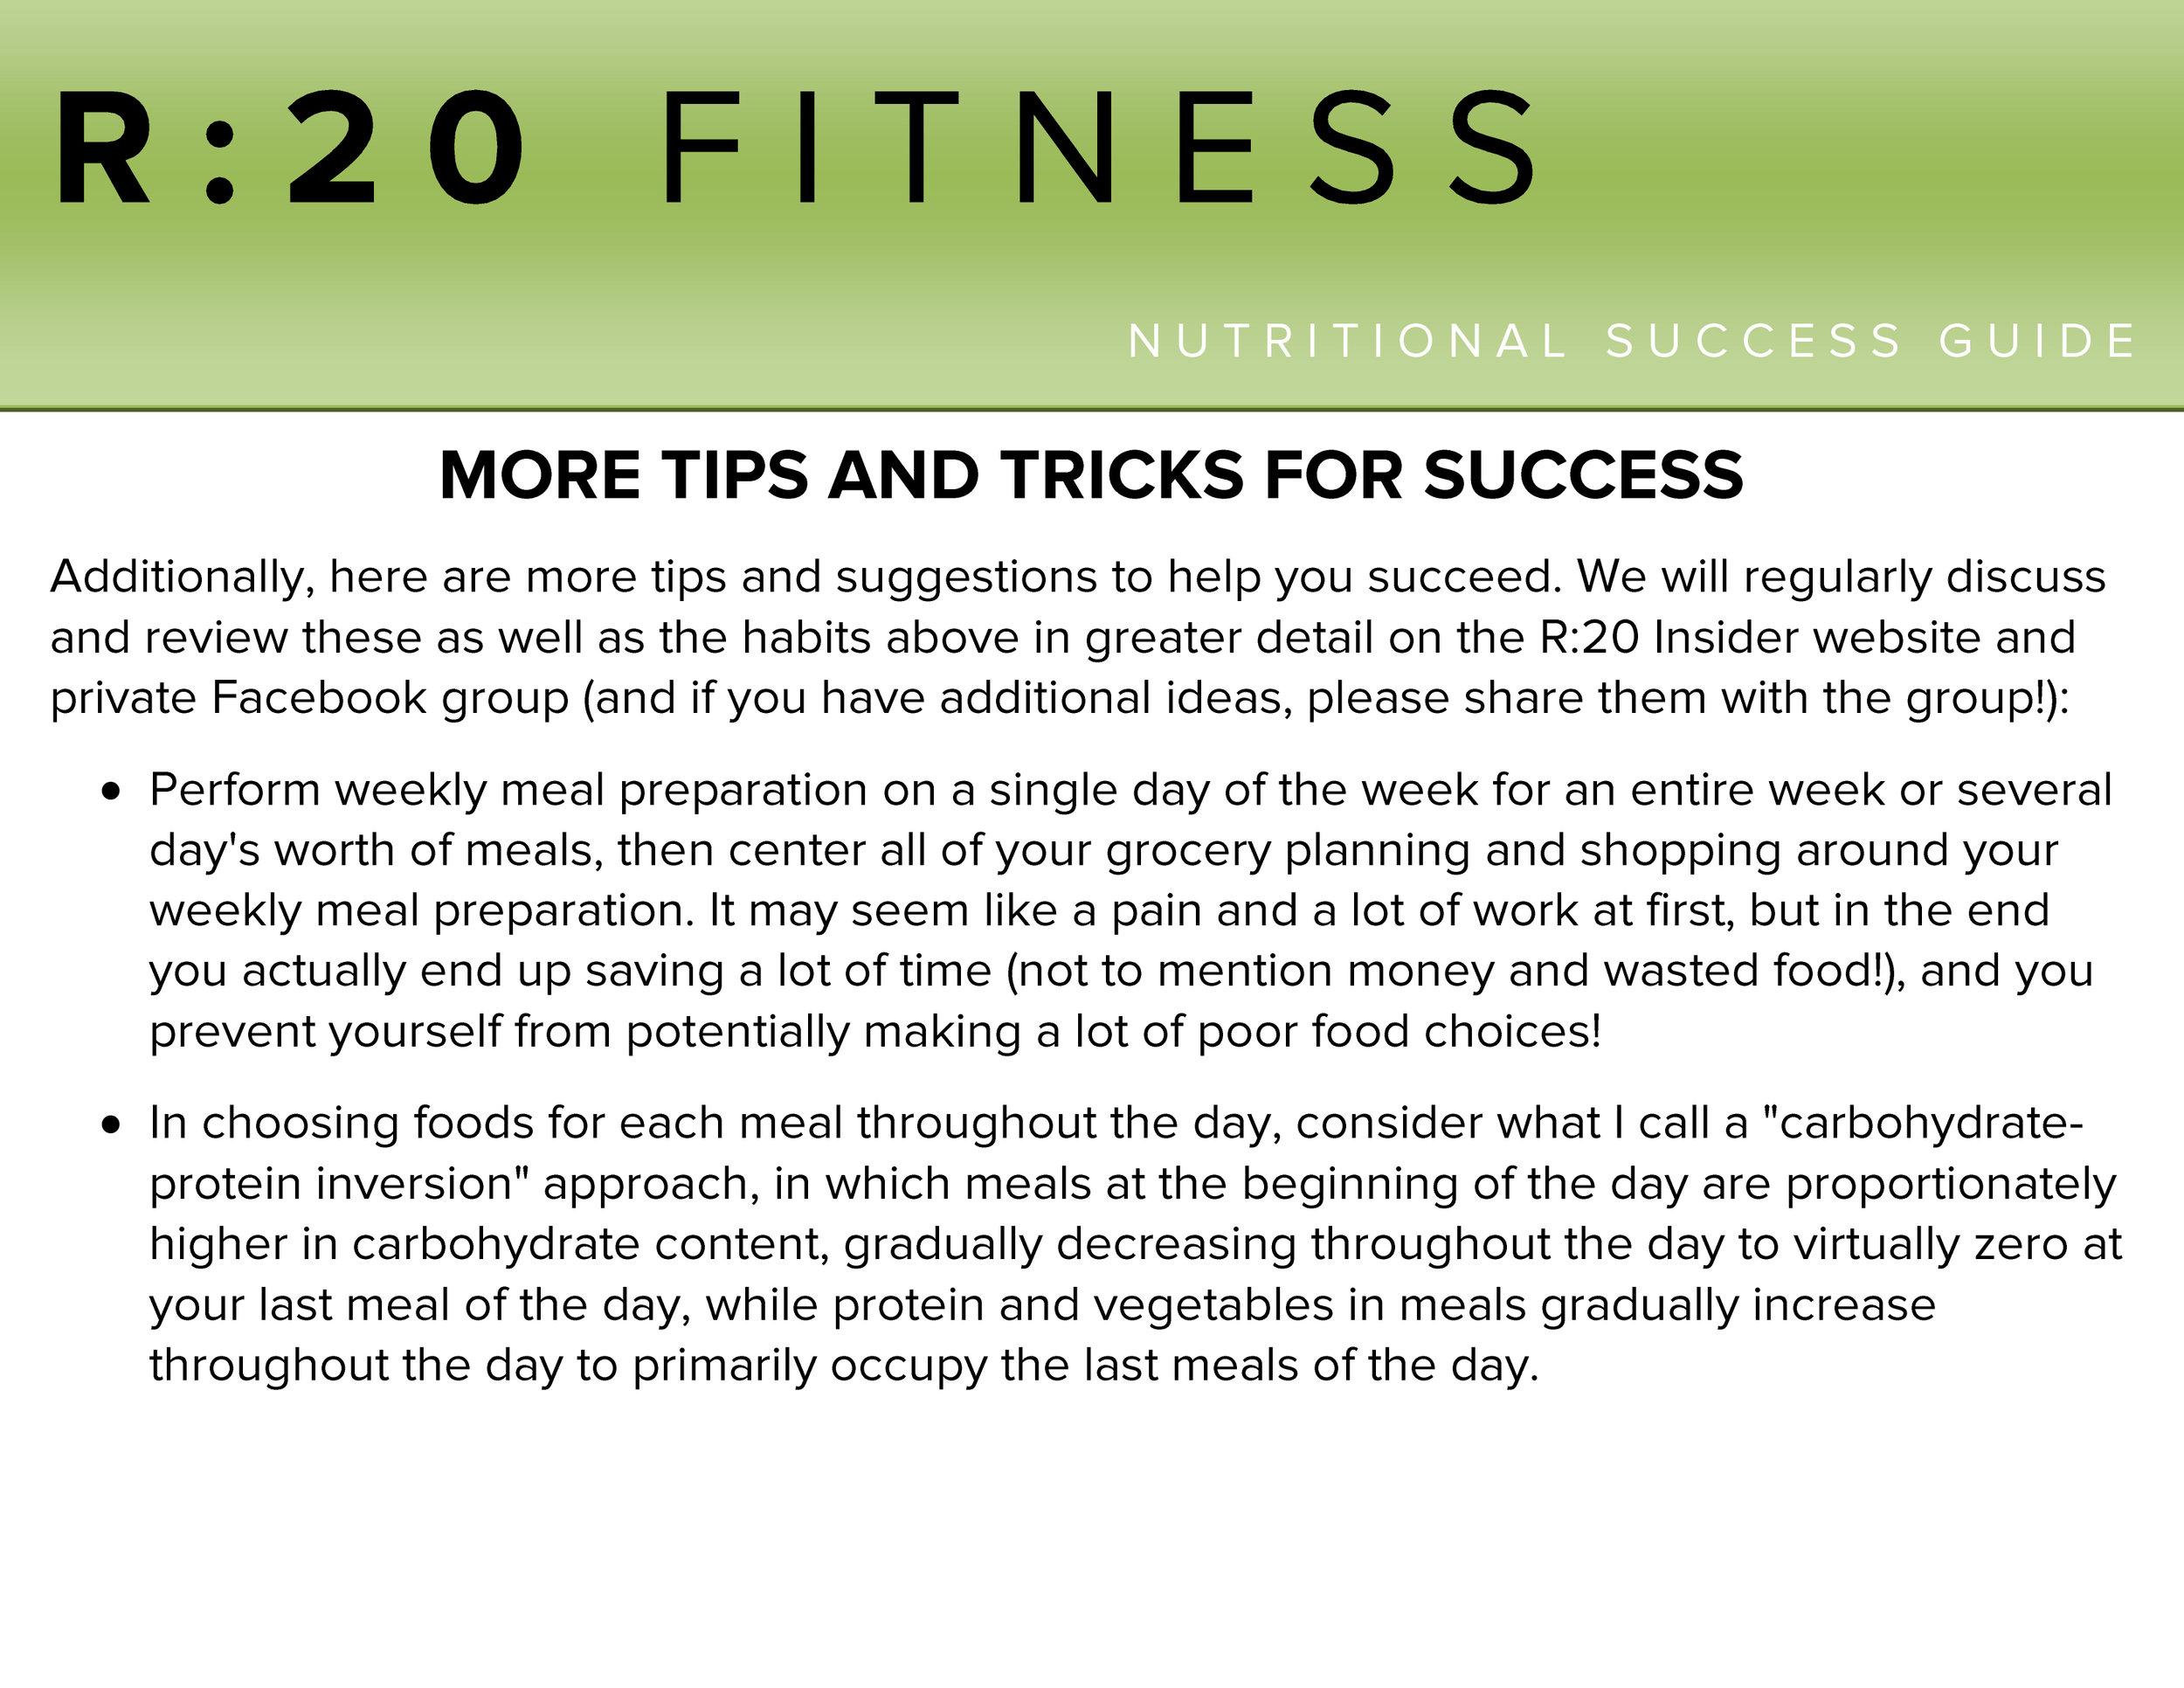 R20 1.0 Nutritional Success Guide-9.jpg